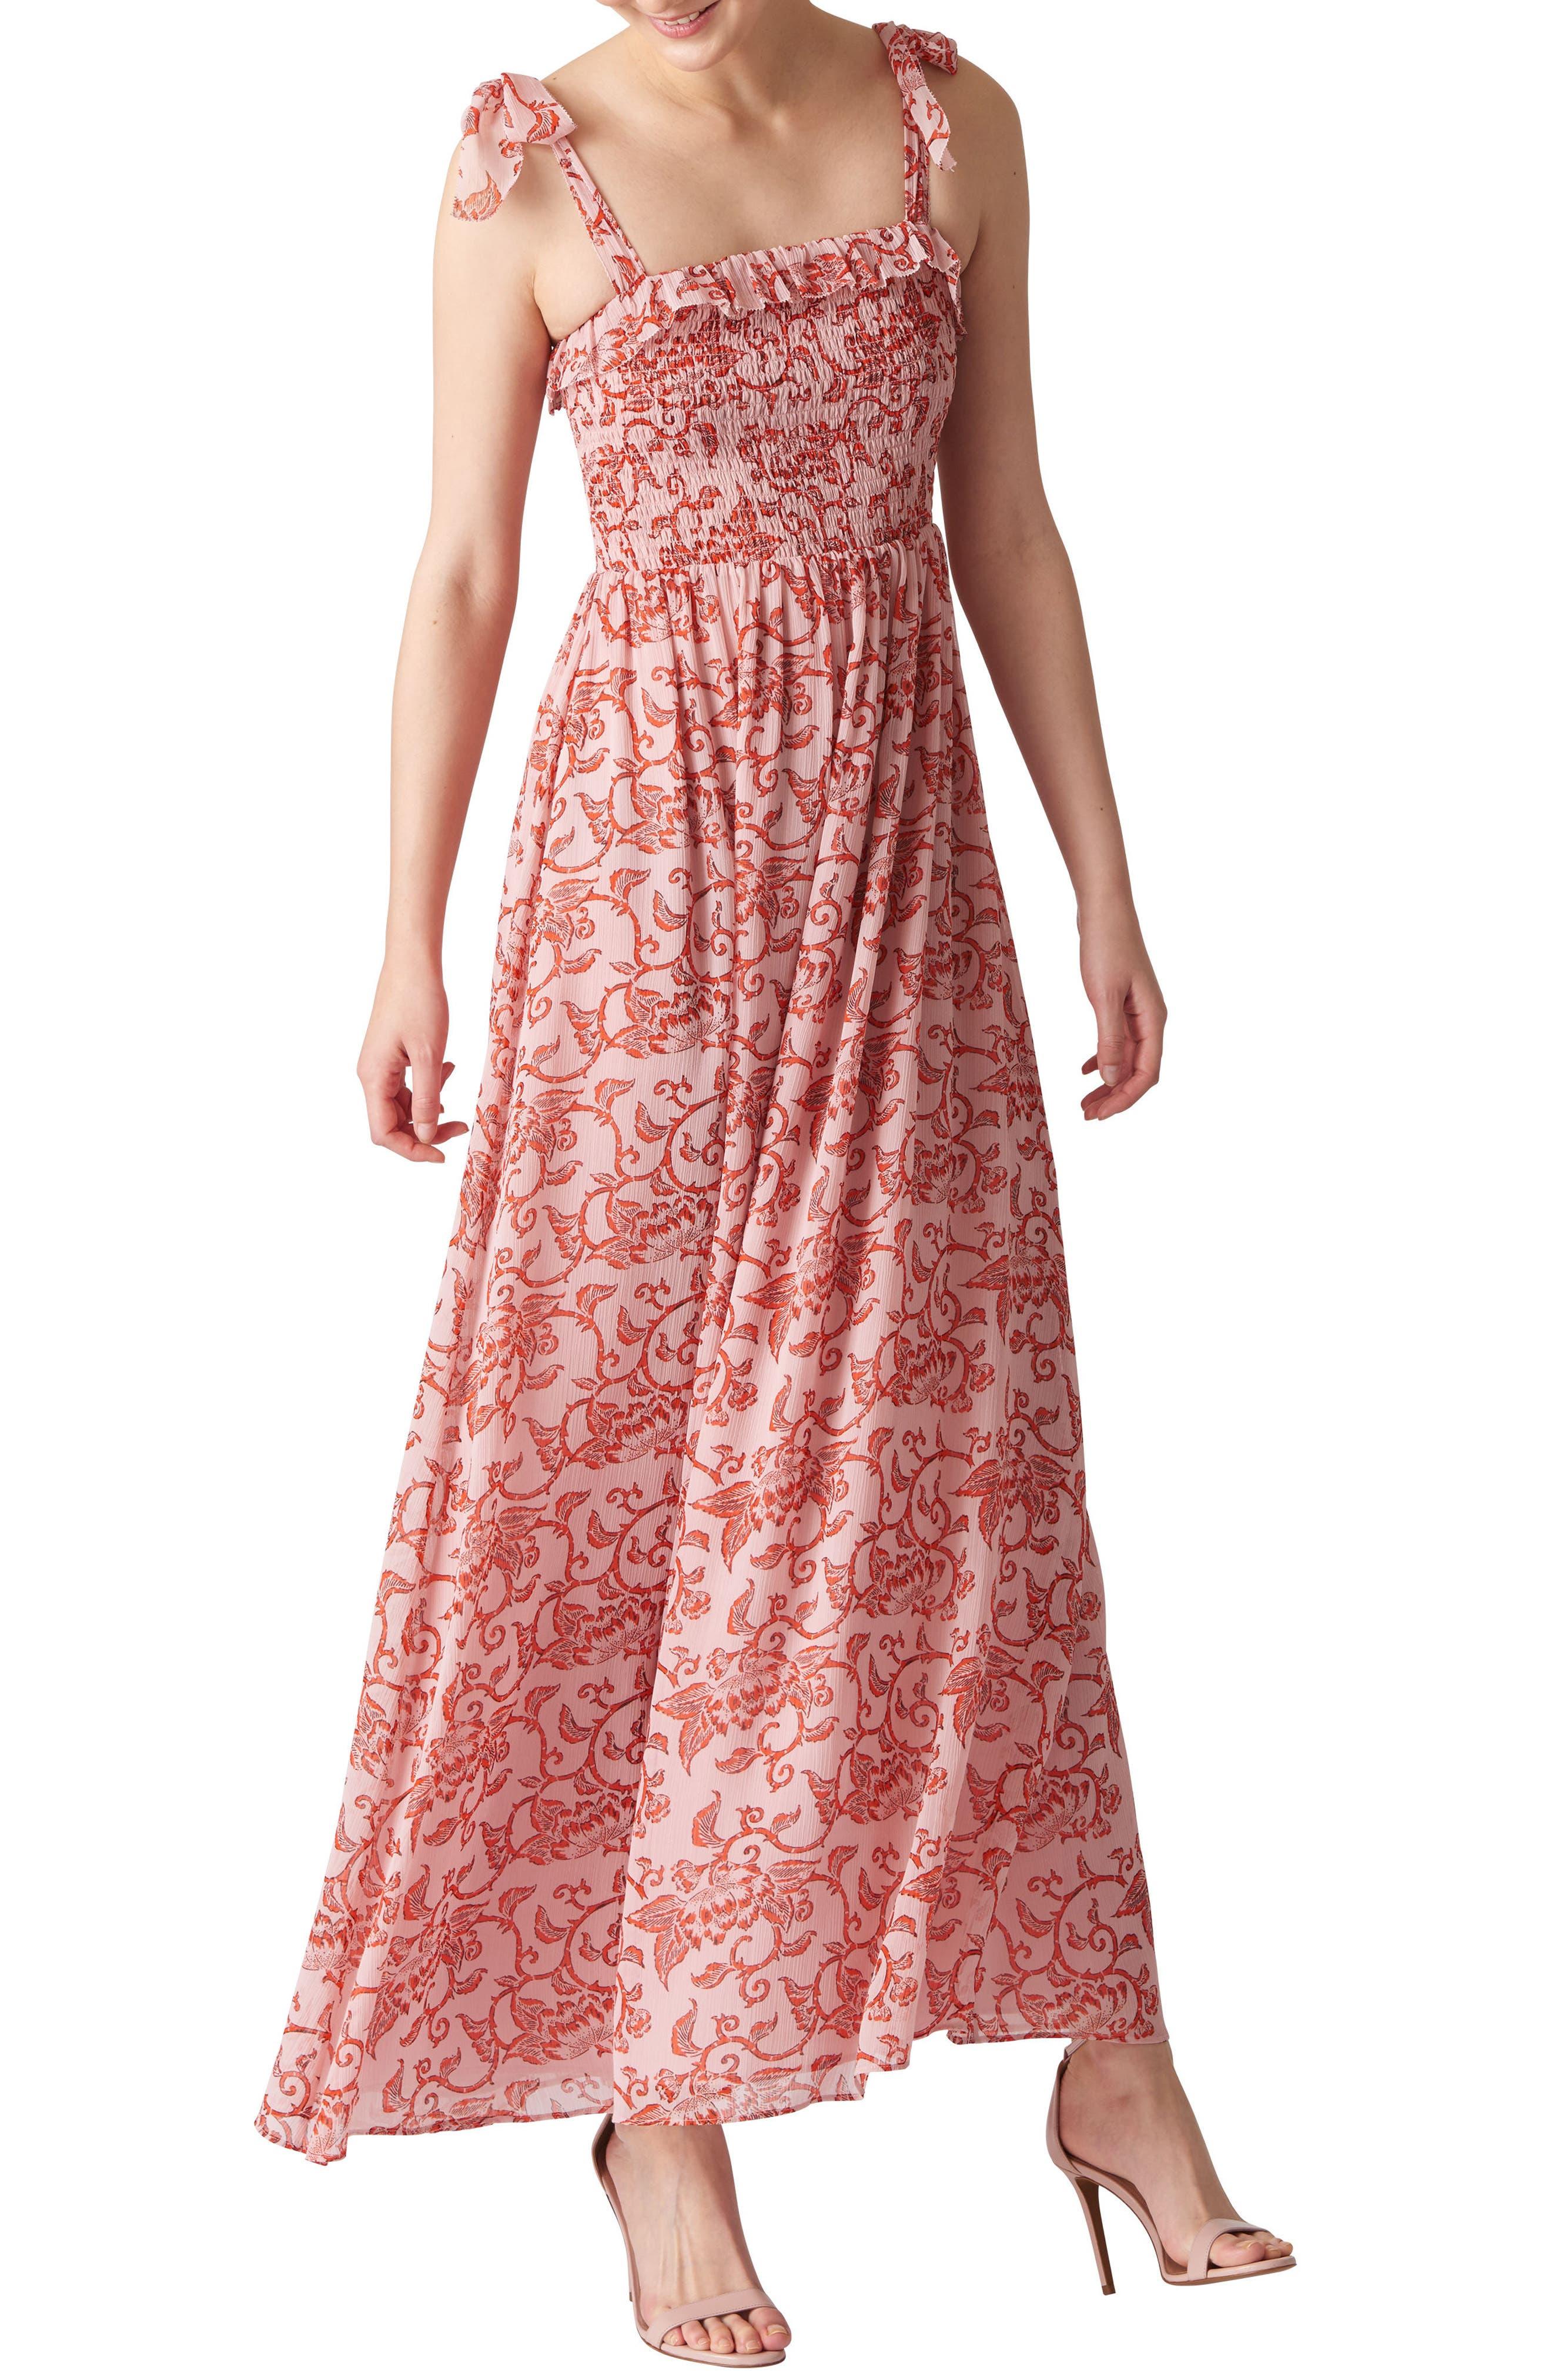 Bali Print Maxi Dress,                             Main thumbnail 1, color,                             Pink/ Multi